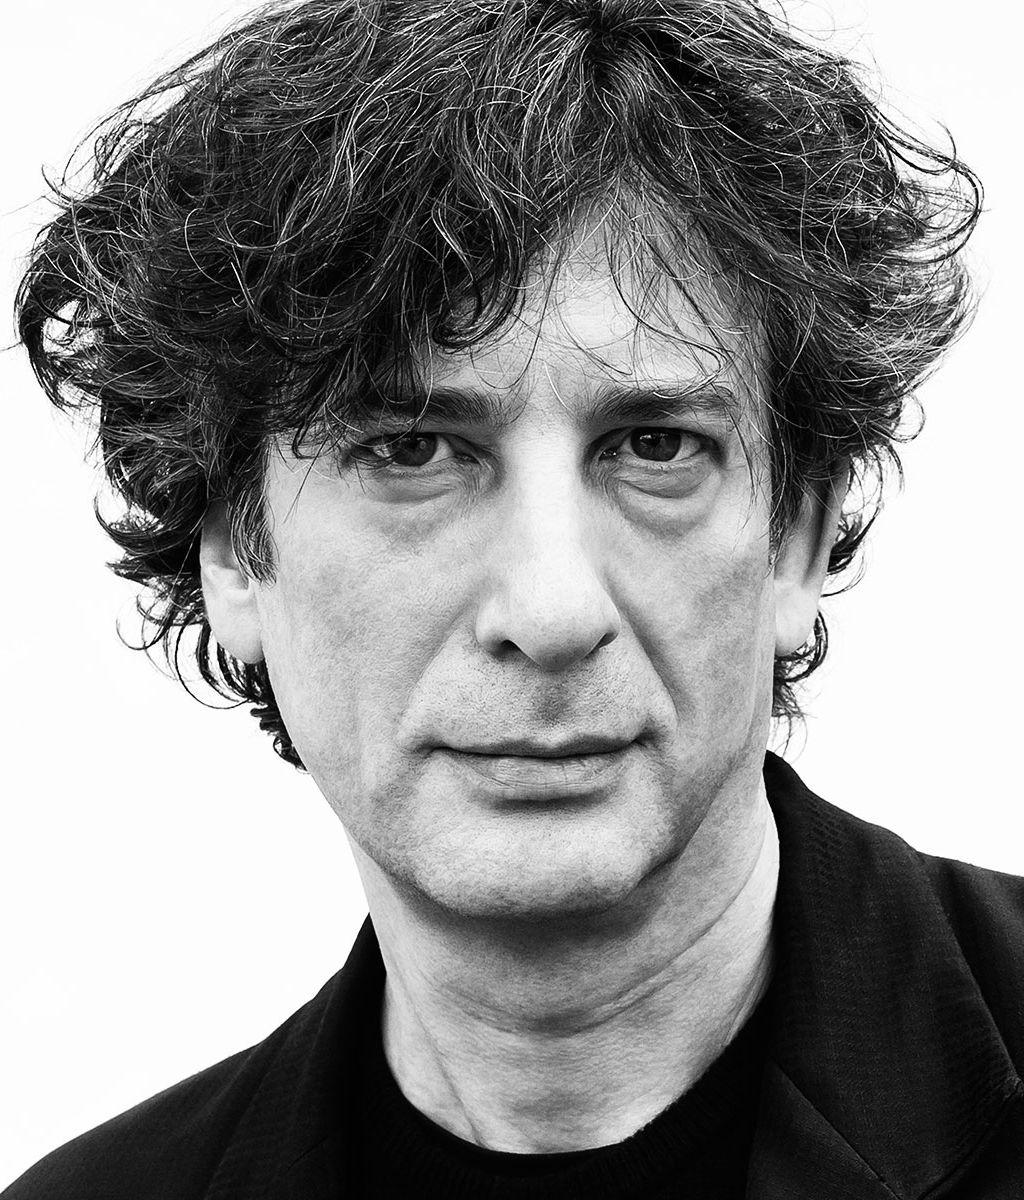 Neil Gaiman: 'American Gods' Is Frighteningly Relevant